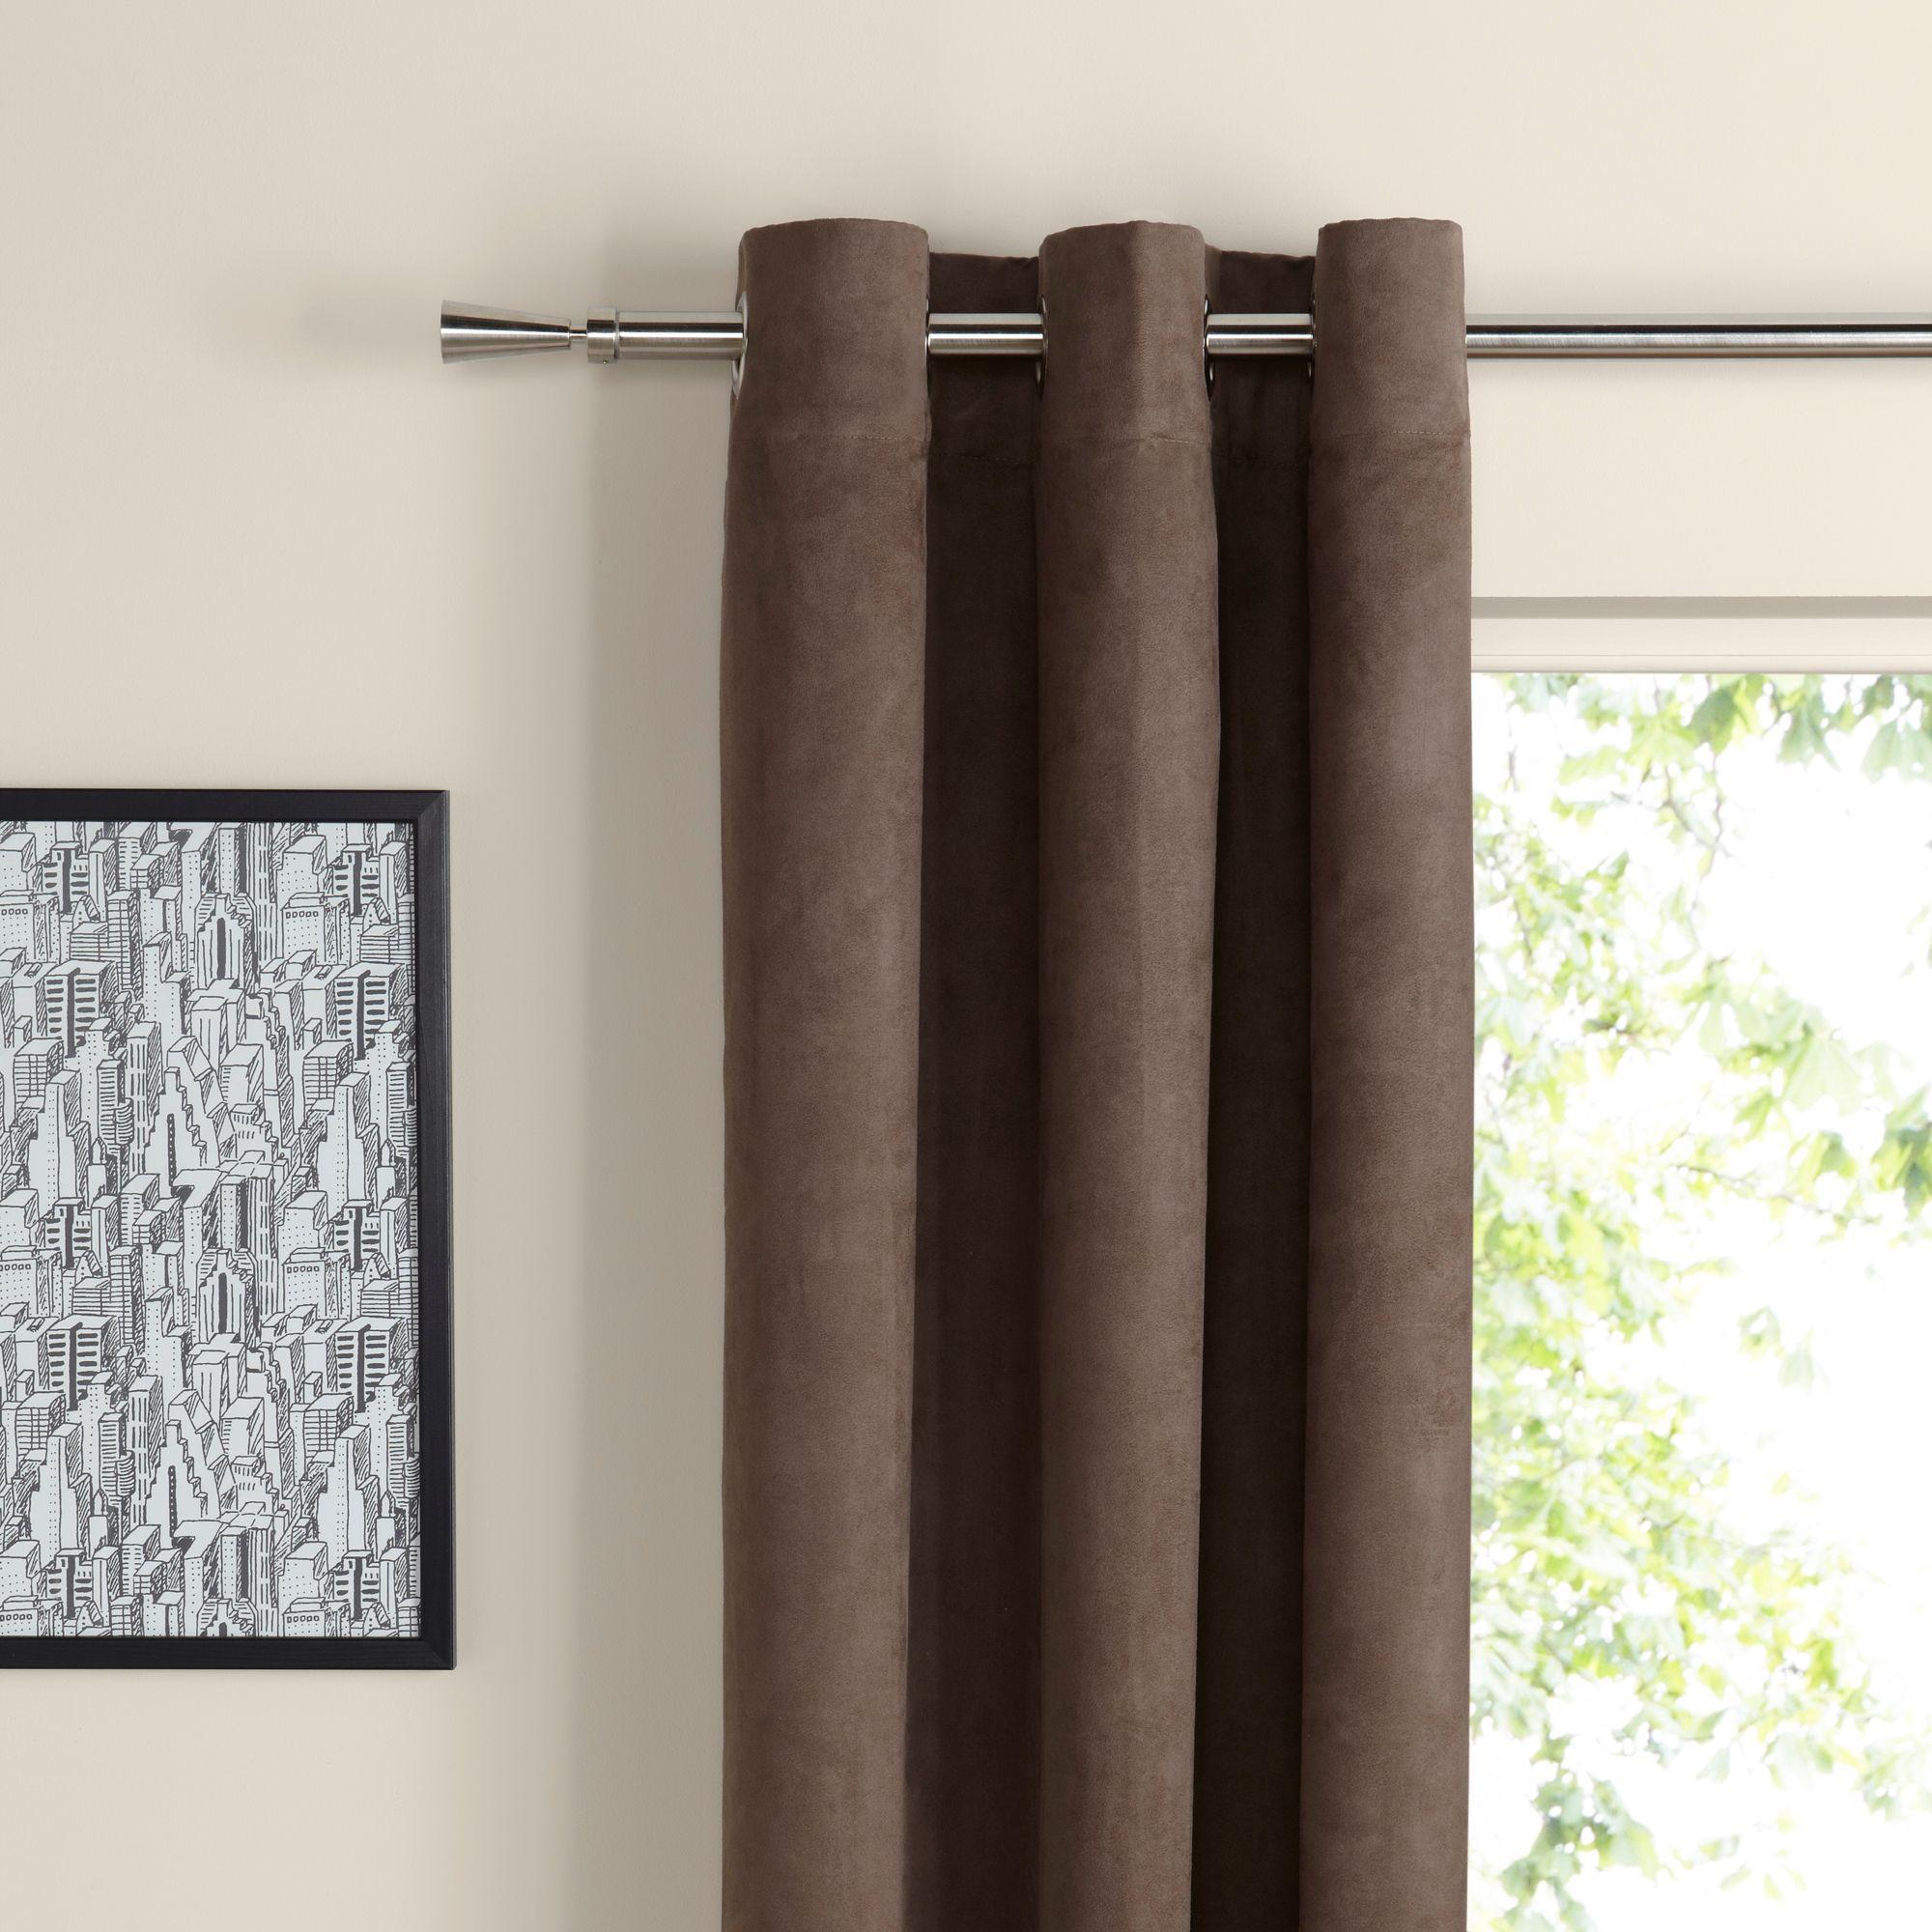 Suedine Chocolate Plain Woven Eyelet Curtains (w)228 Cm (l)228 Cm